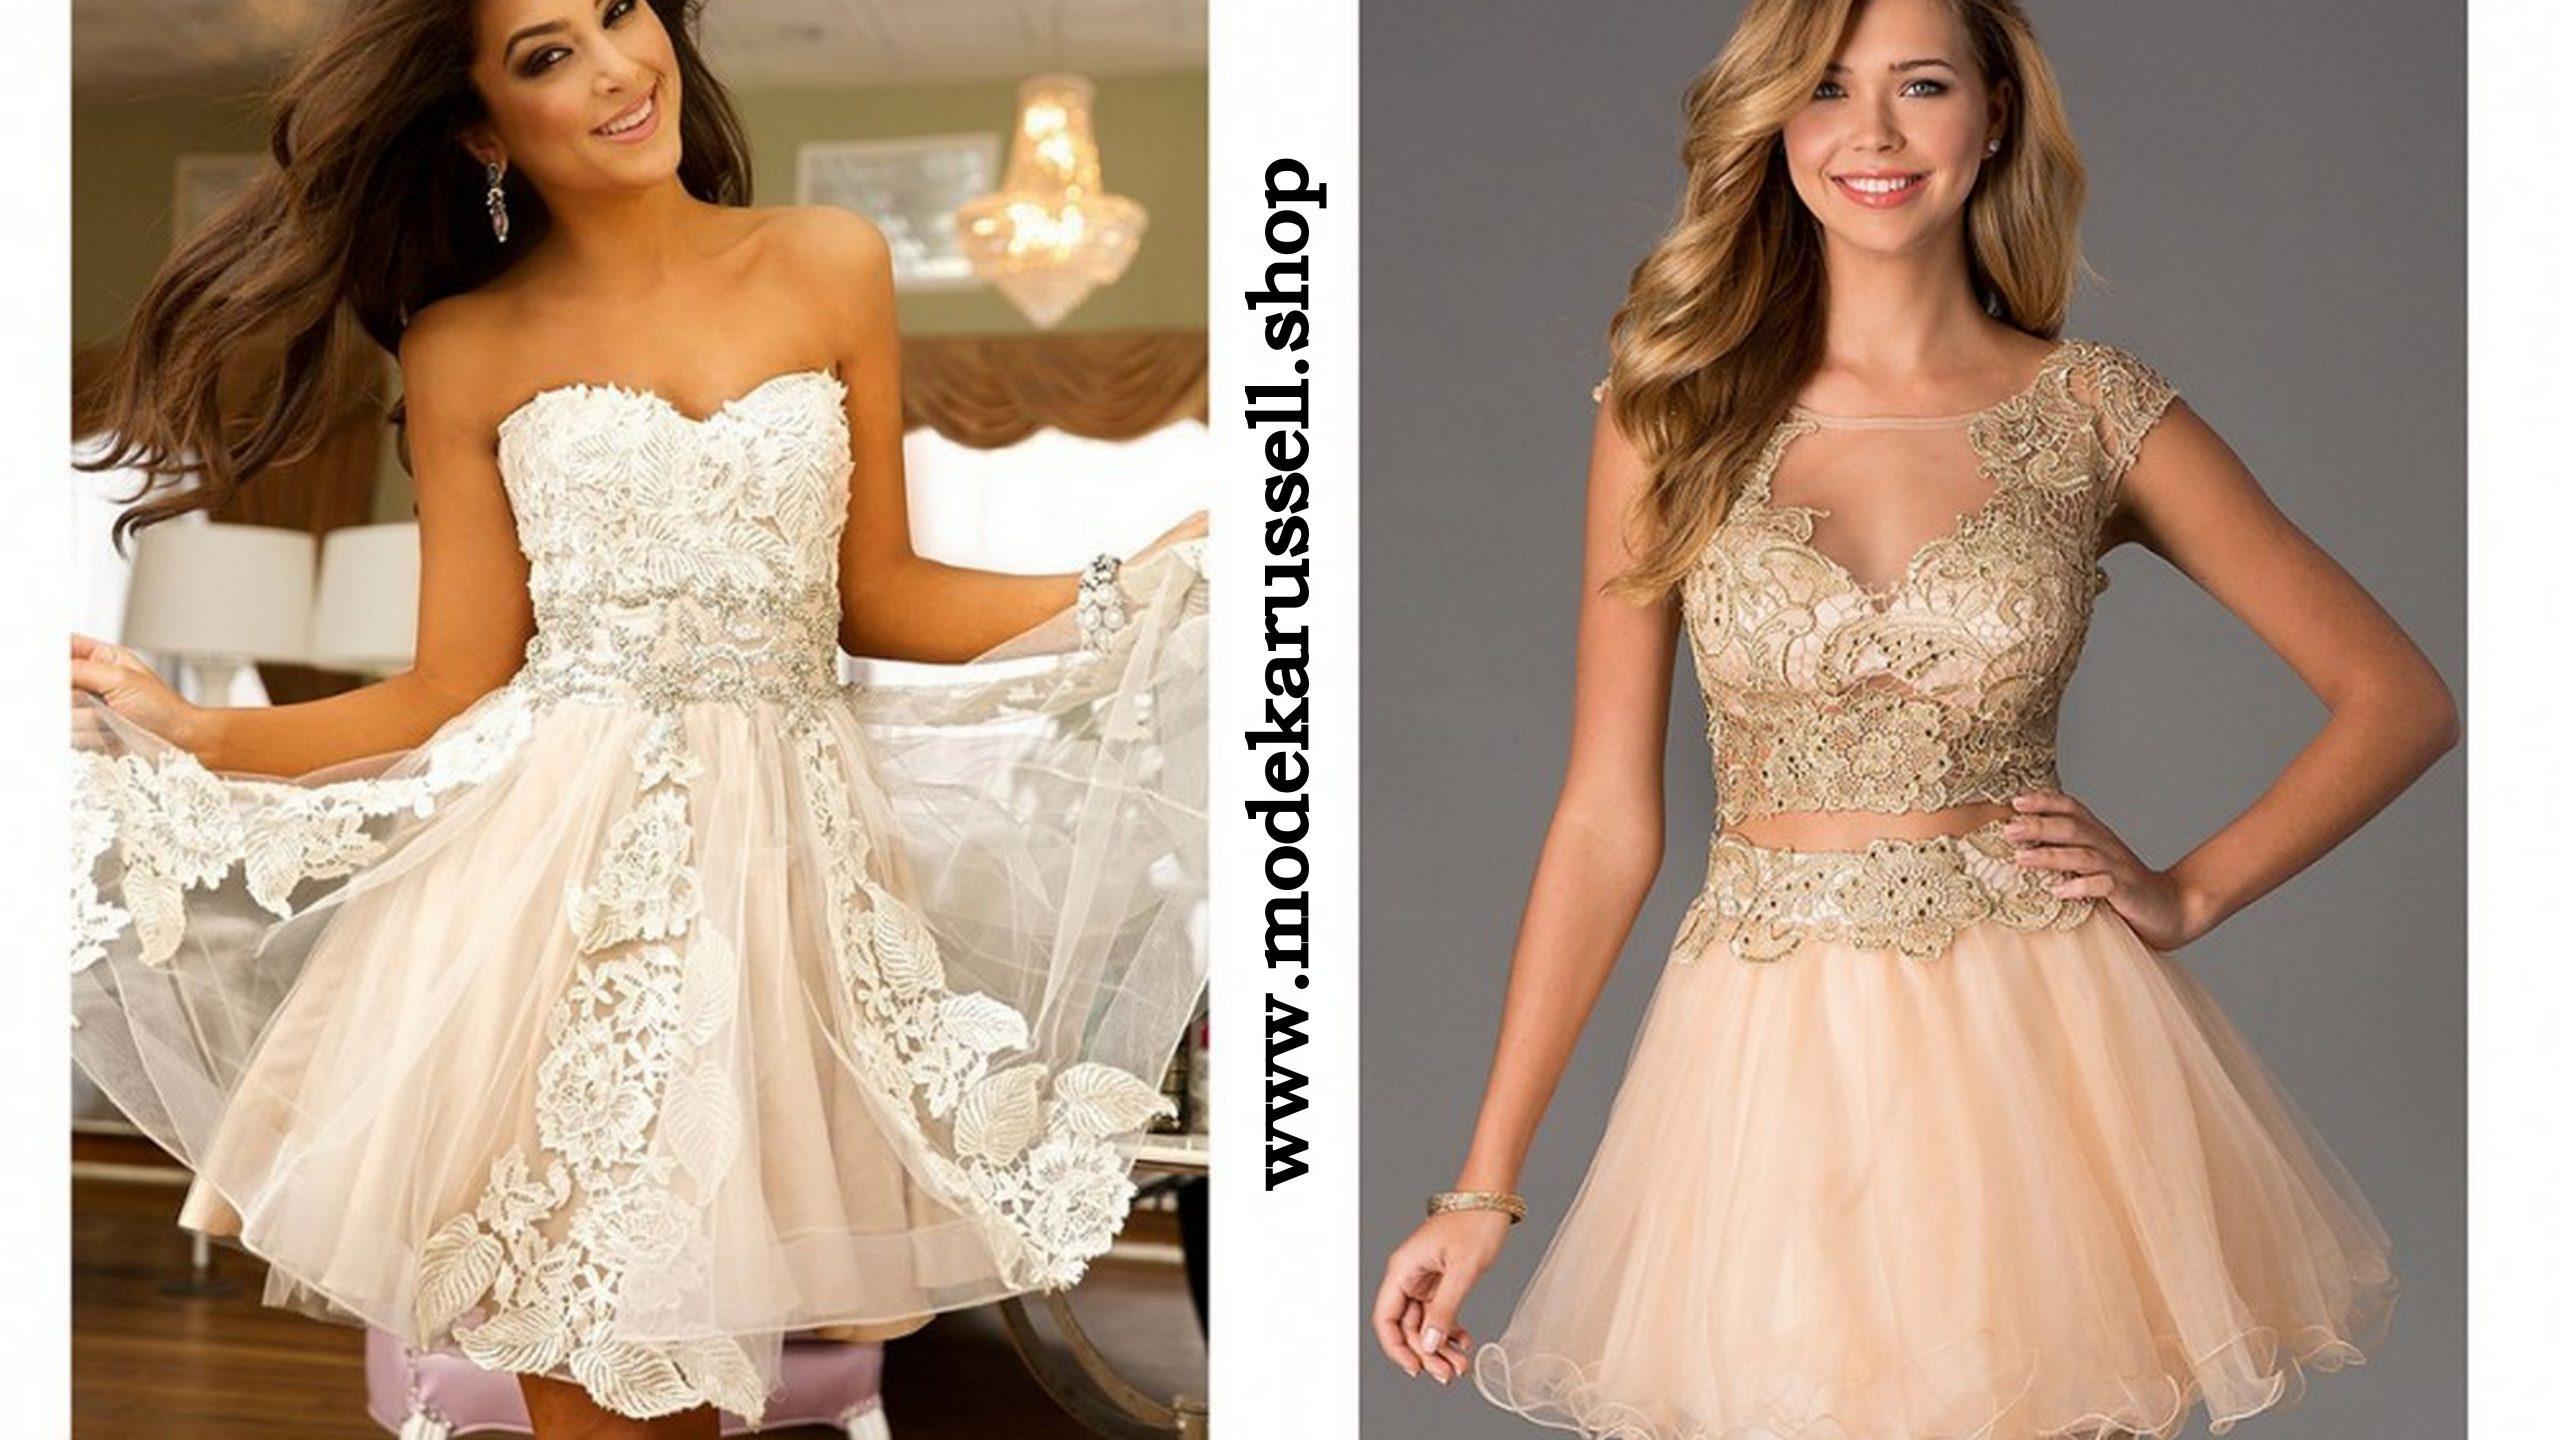 15 Top Abendkleid Kurz VertriebFormal Luxus Abendkleid Kurz Design